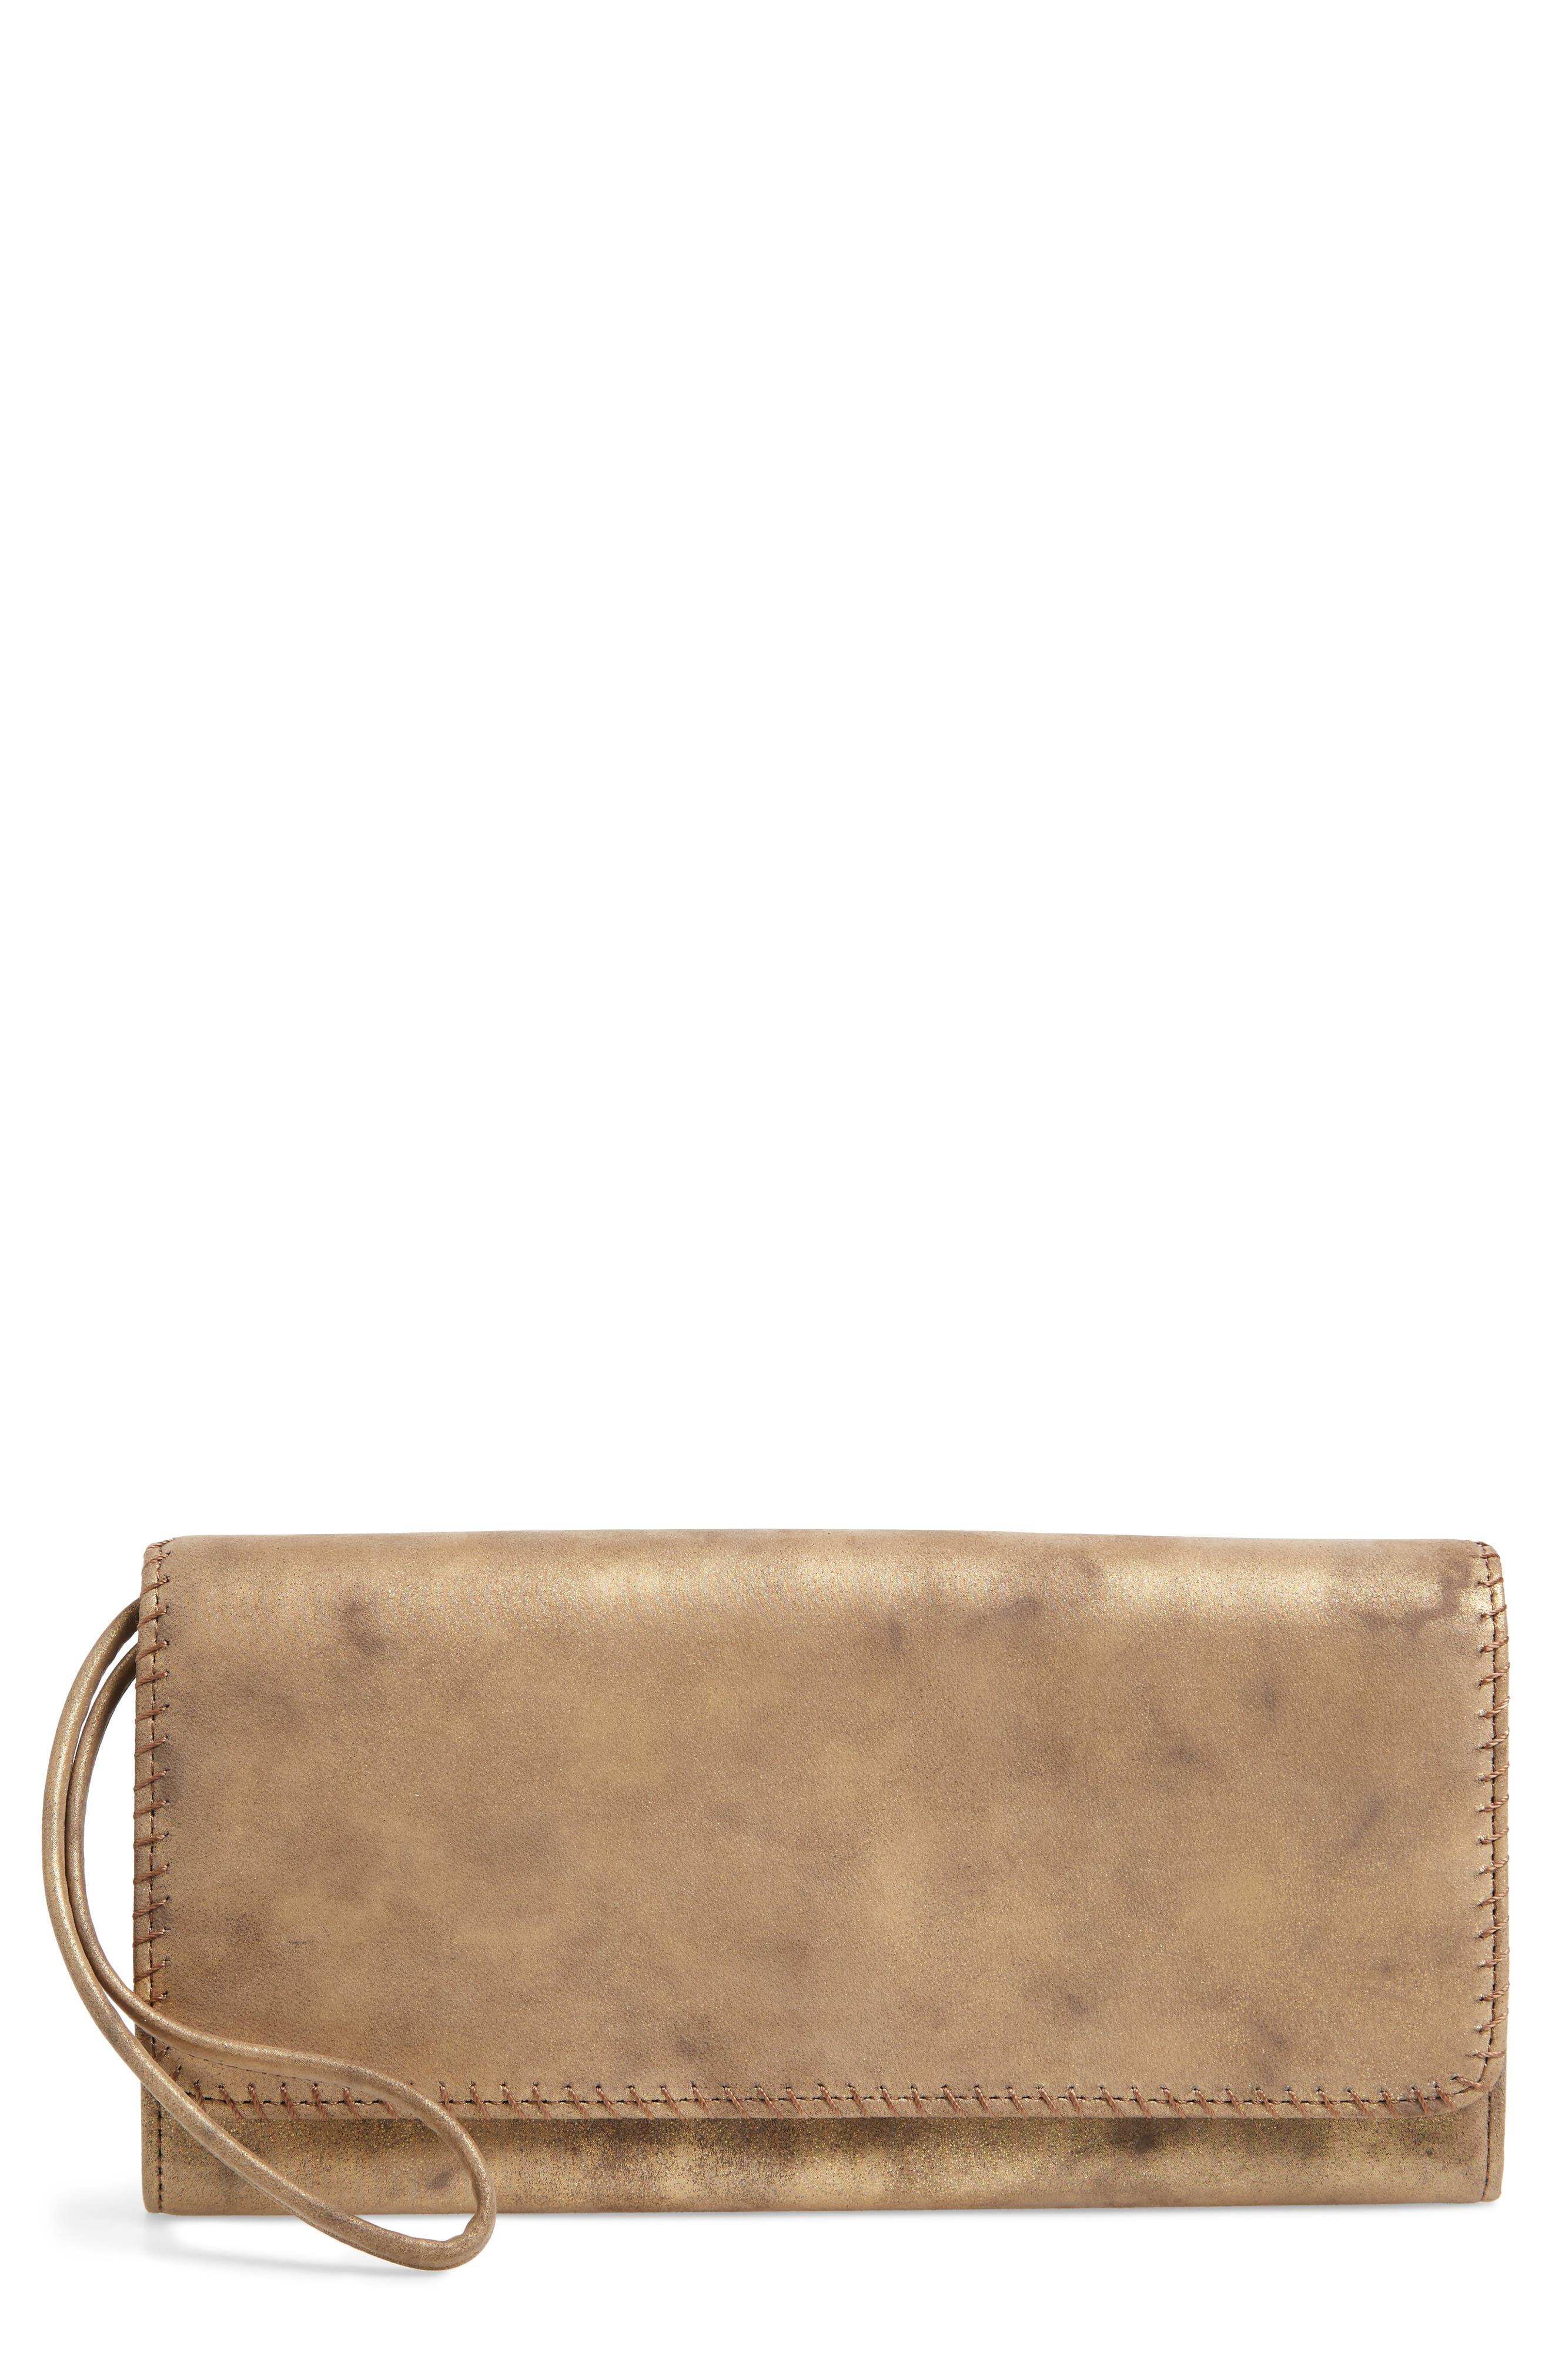 Main Image - Hobo Era Wristie Leather Wallet